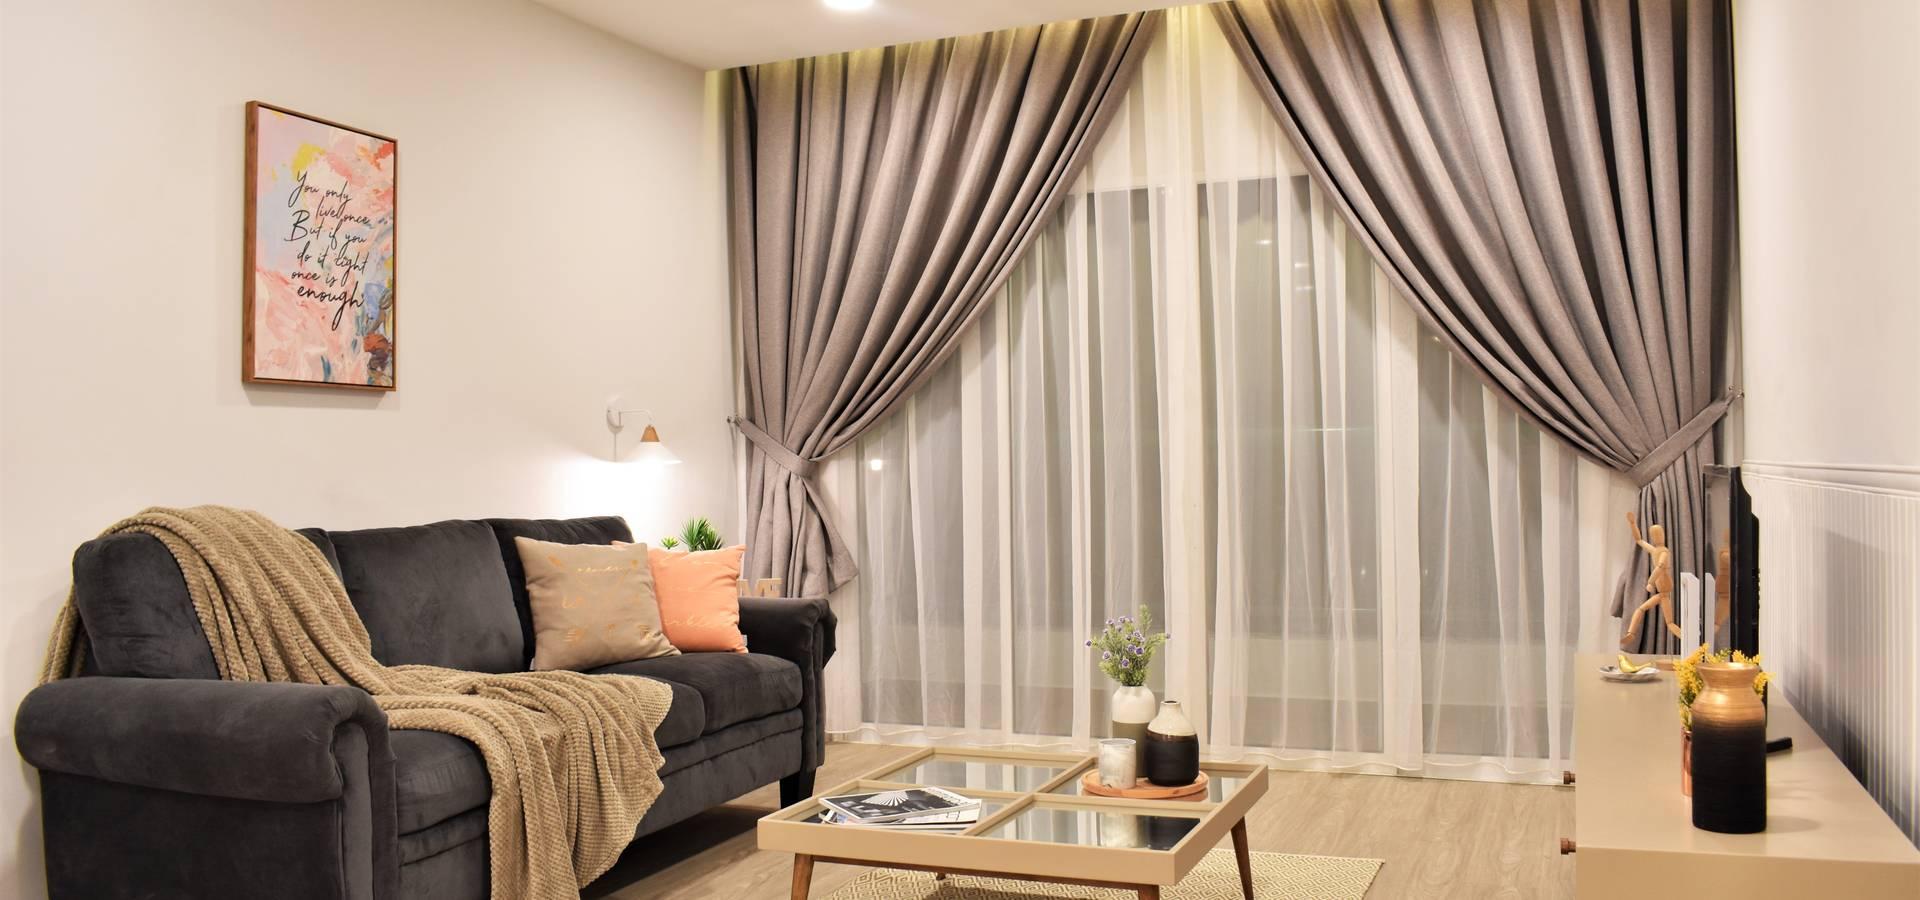 Infini Home Concept Sdn. Bhd.